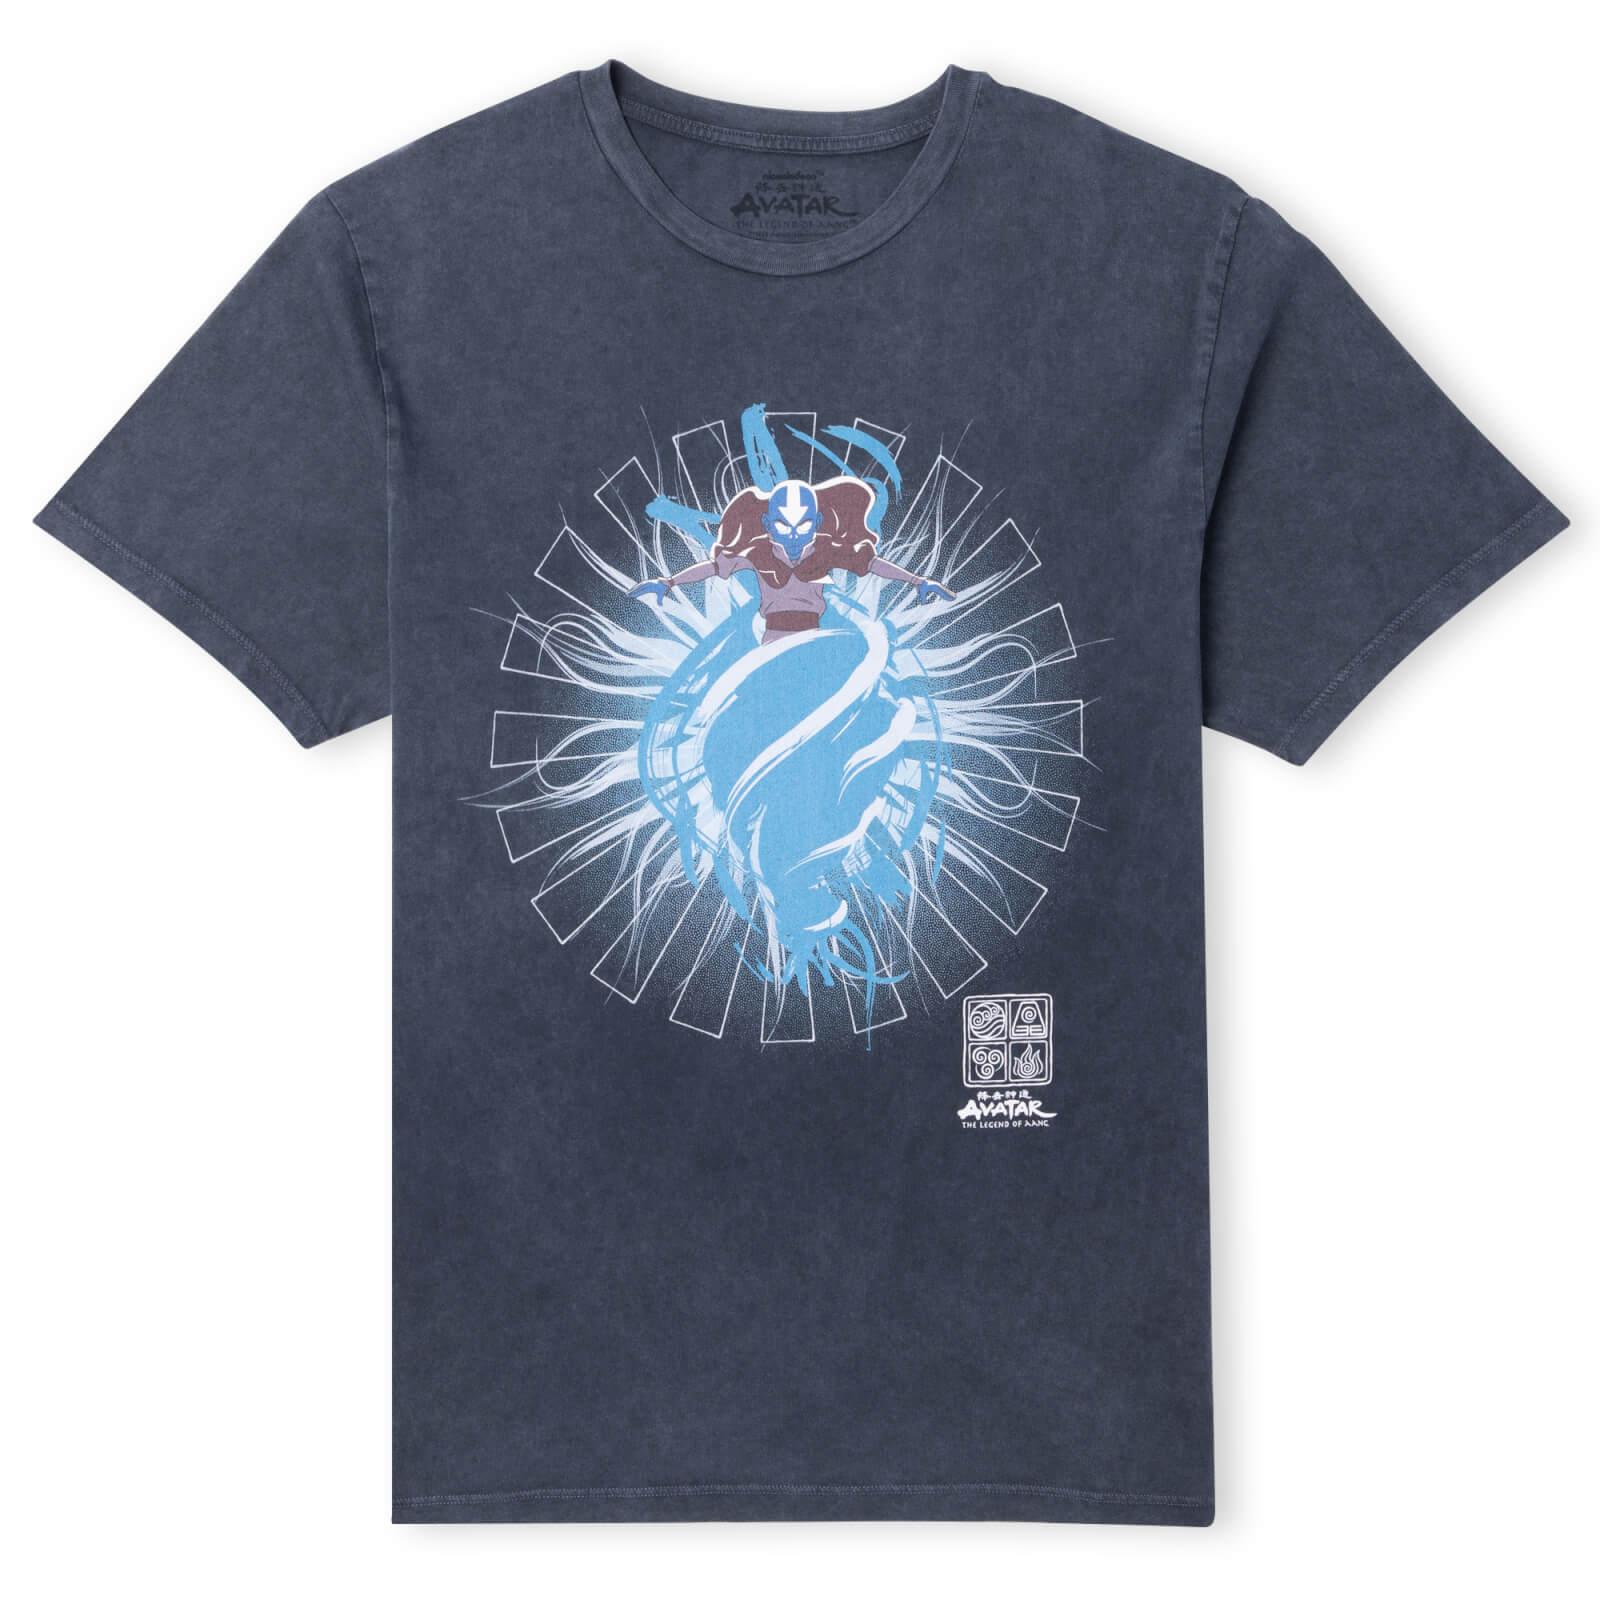 Avatar The Last Avatar Unisex T-Shirt - Navy Acid Wash - M